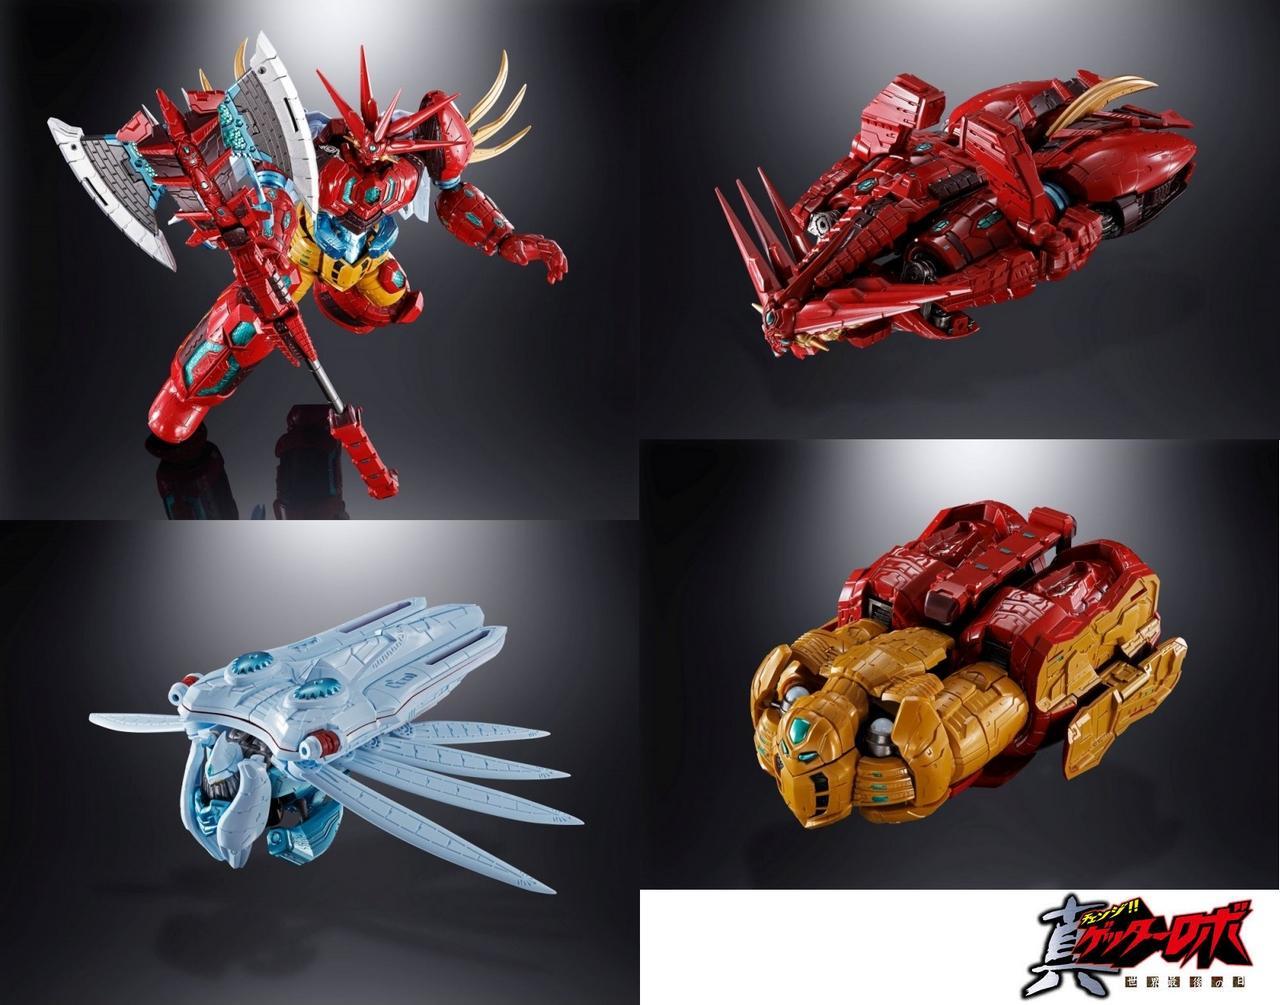 Bandai tamashii soul of chogokin gx 87 getter robo emperor 22cm 1